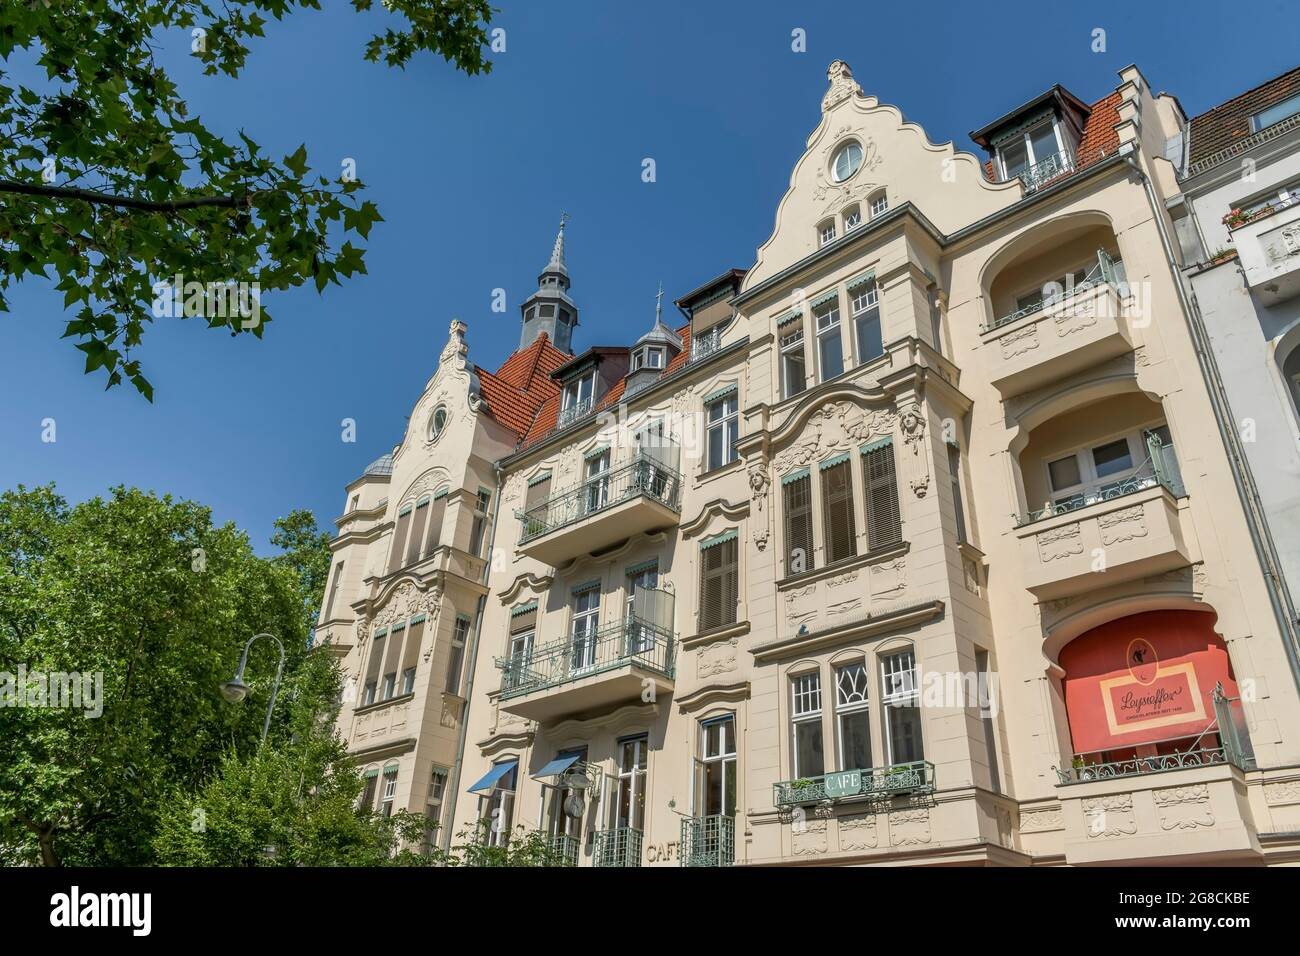 Altbau, Schlossstrasse, Steglitz, Berlin, Allemagne Banque D'Images